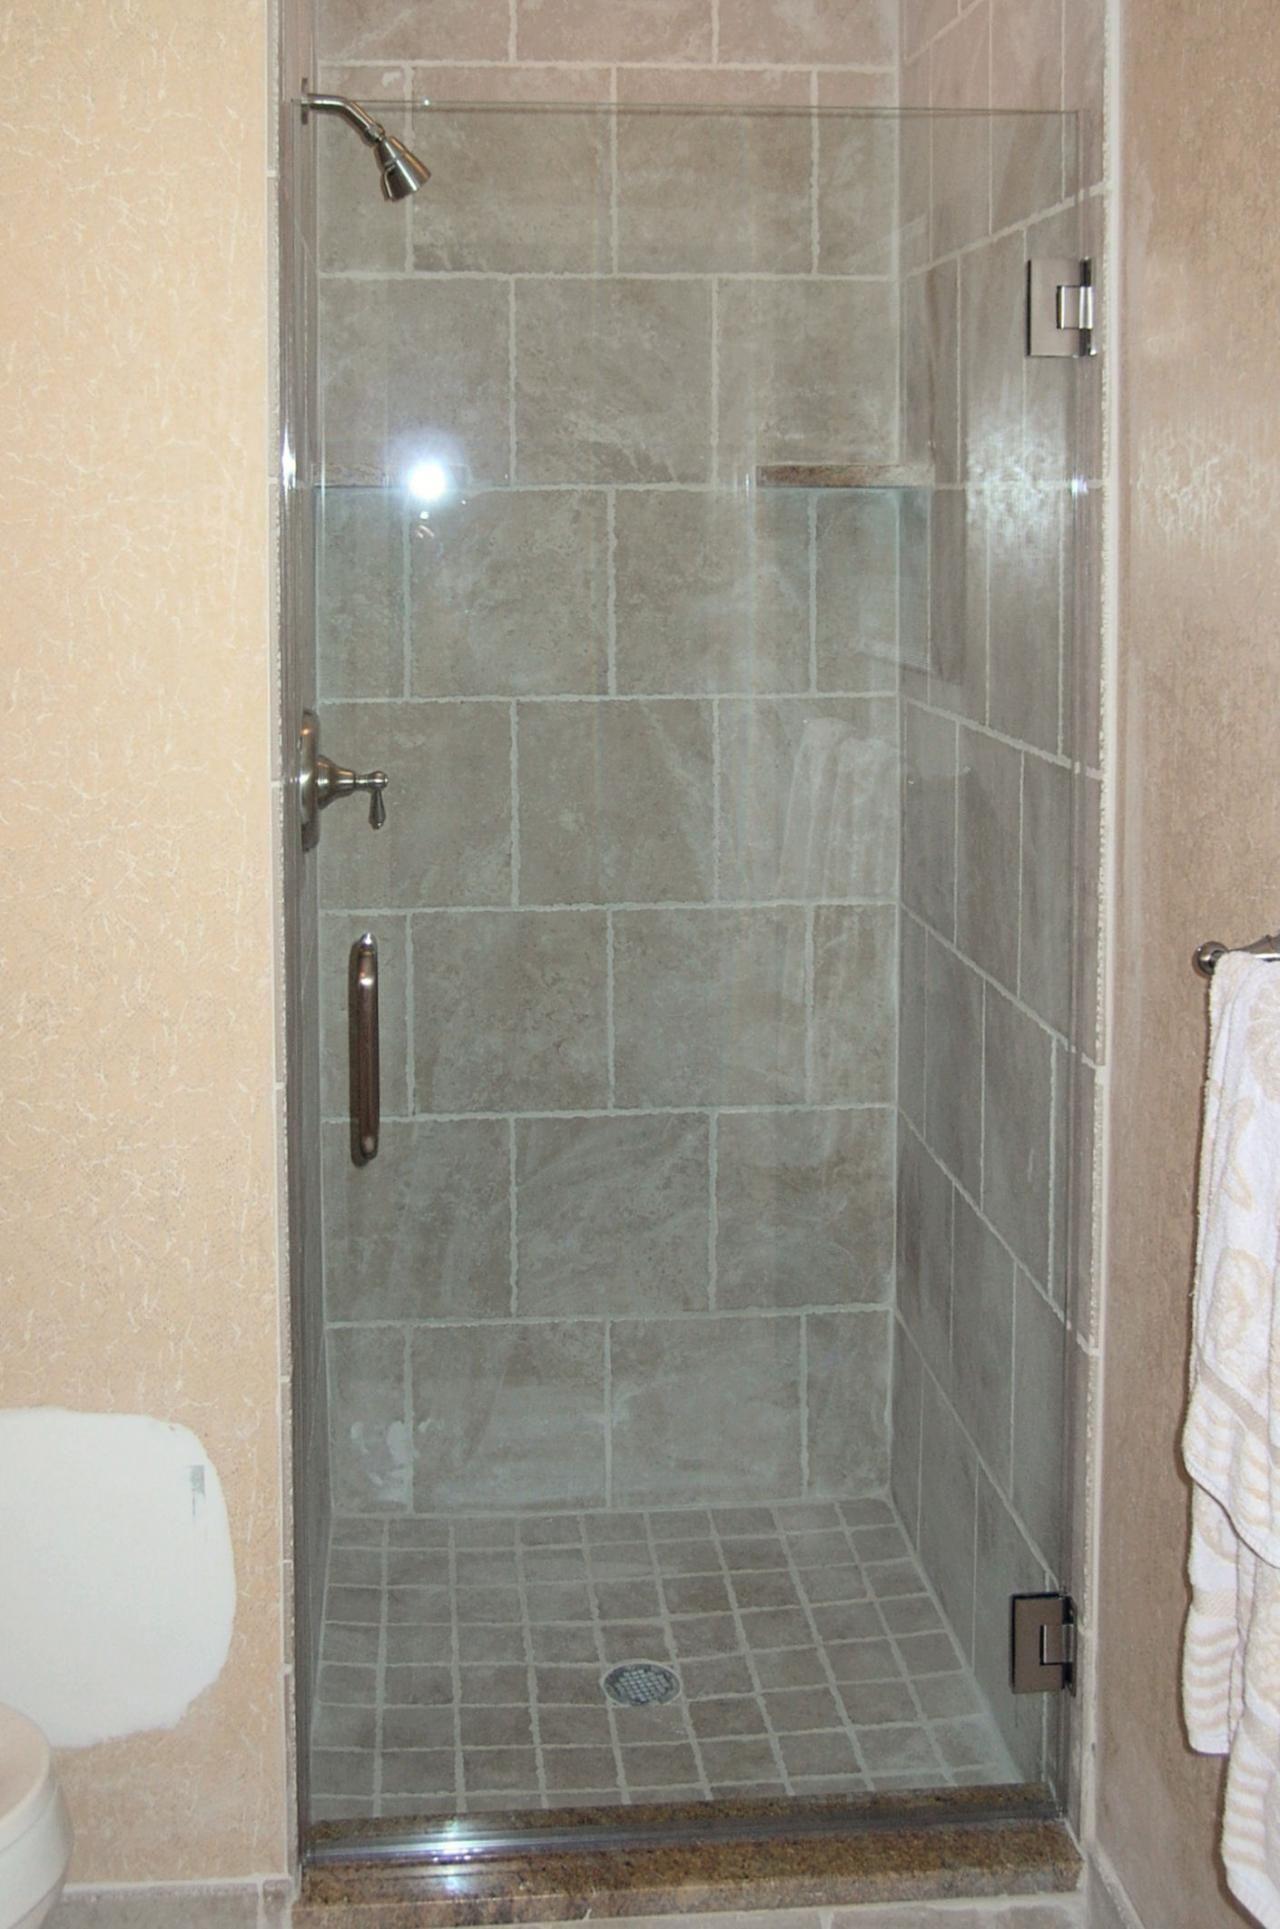 Single Panel Glass Shower Doors Glass Shower Doors Shower Remodel Small Bathroom Makeover